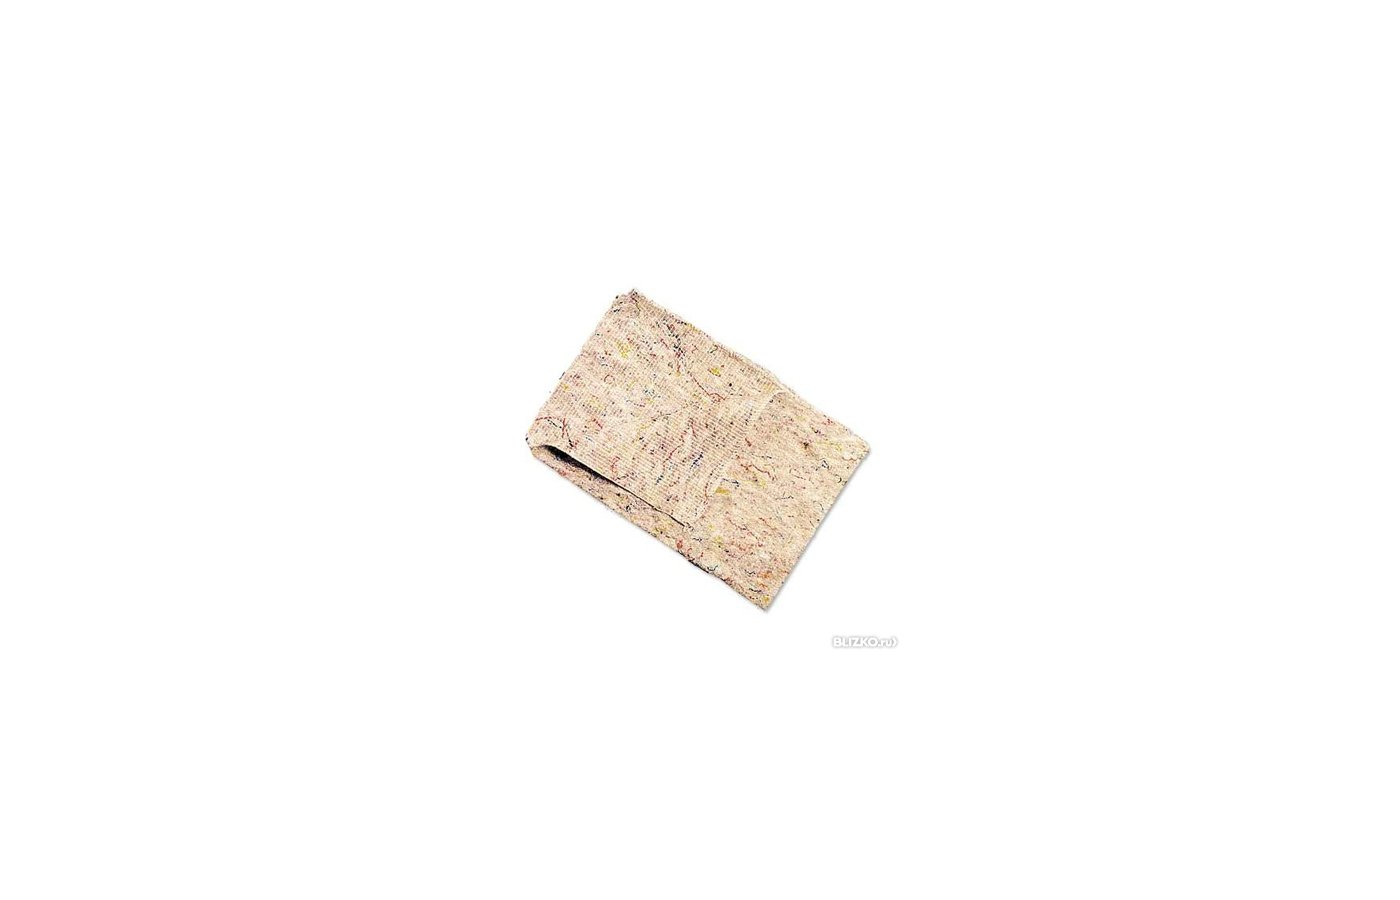 Инвентарь для уборки ФБ Салфетка д/уб вискоз.Фламенко п/п (3 шт) 18203300/85100/18203350